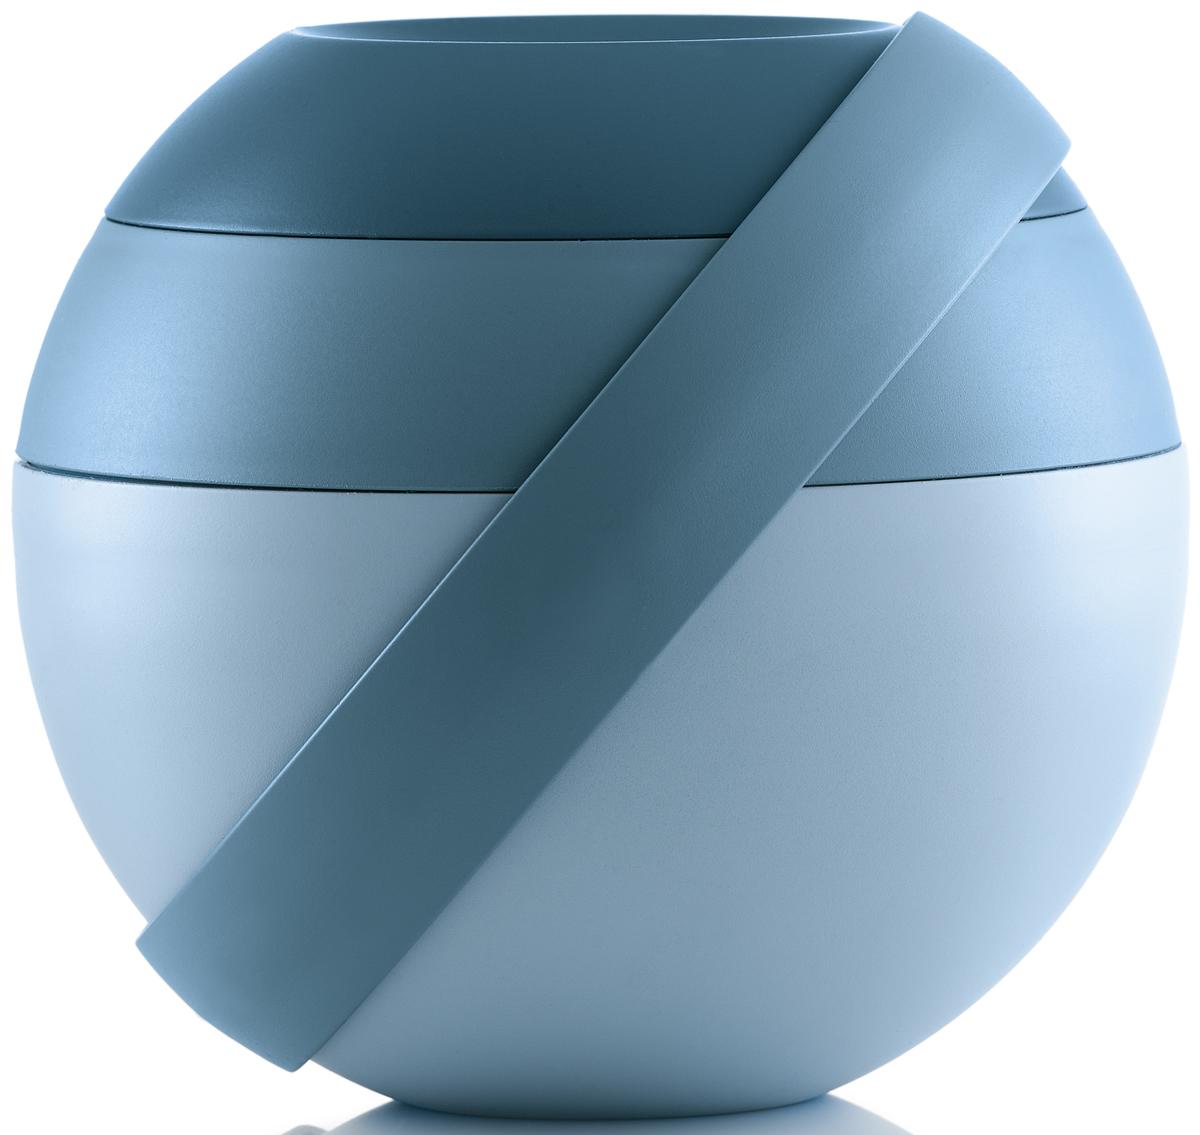 "Ланч-бокс для салатов Guzzini ""Zero"", цвет: синий, 388 мл + 780 мл, 5 предметов"